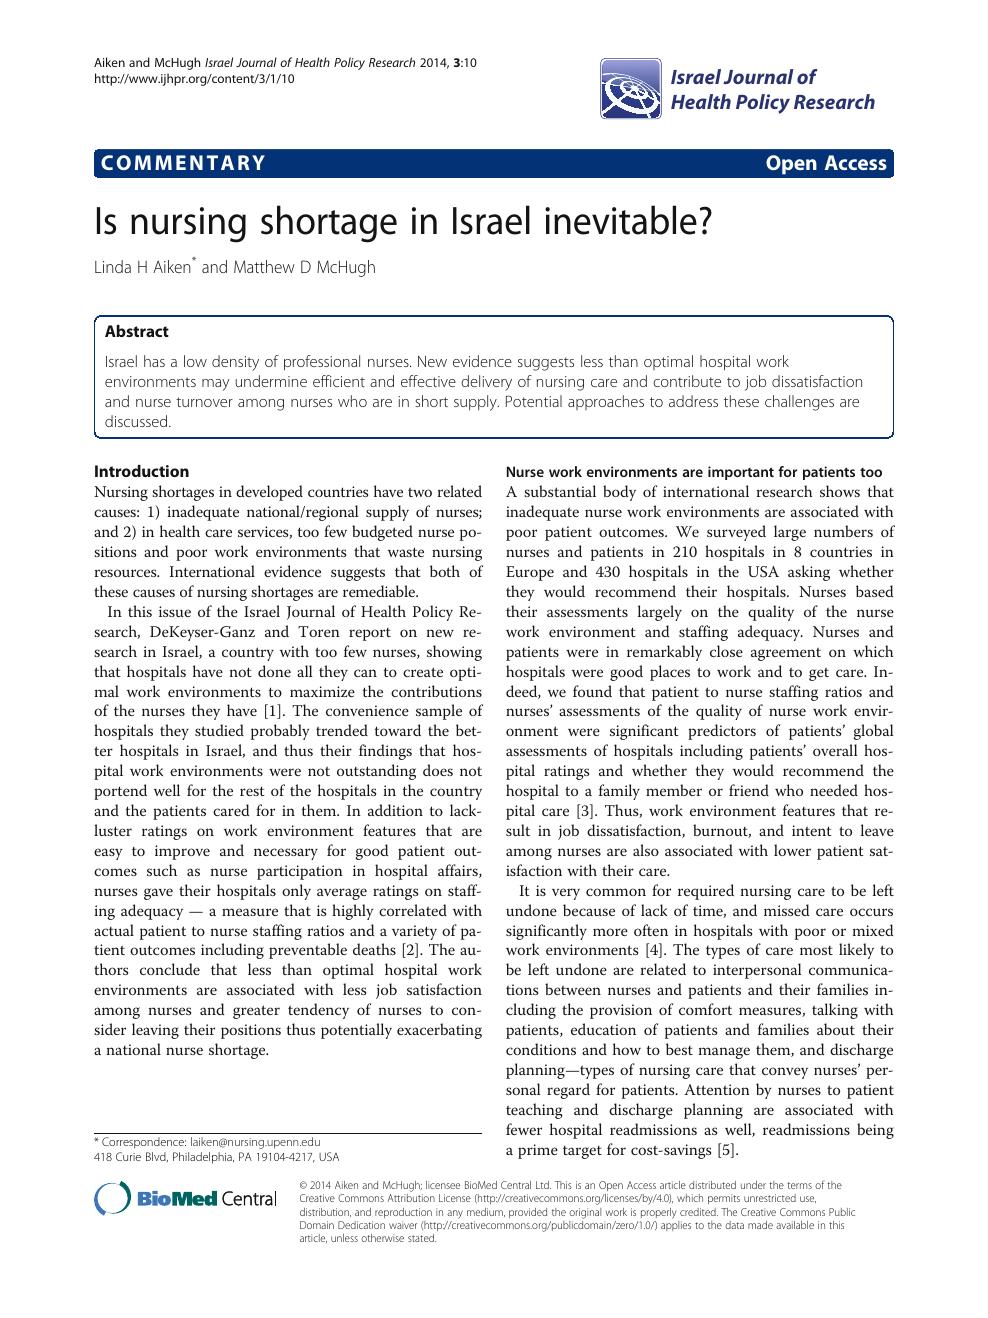 research paper on nursing shortage